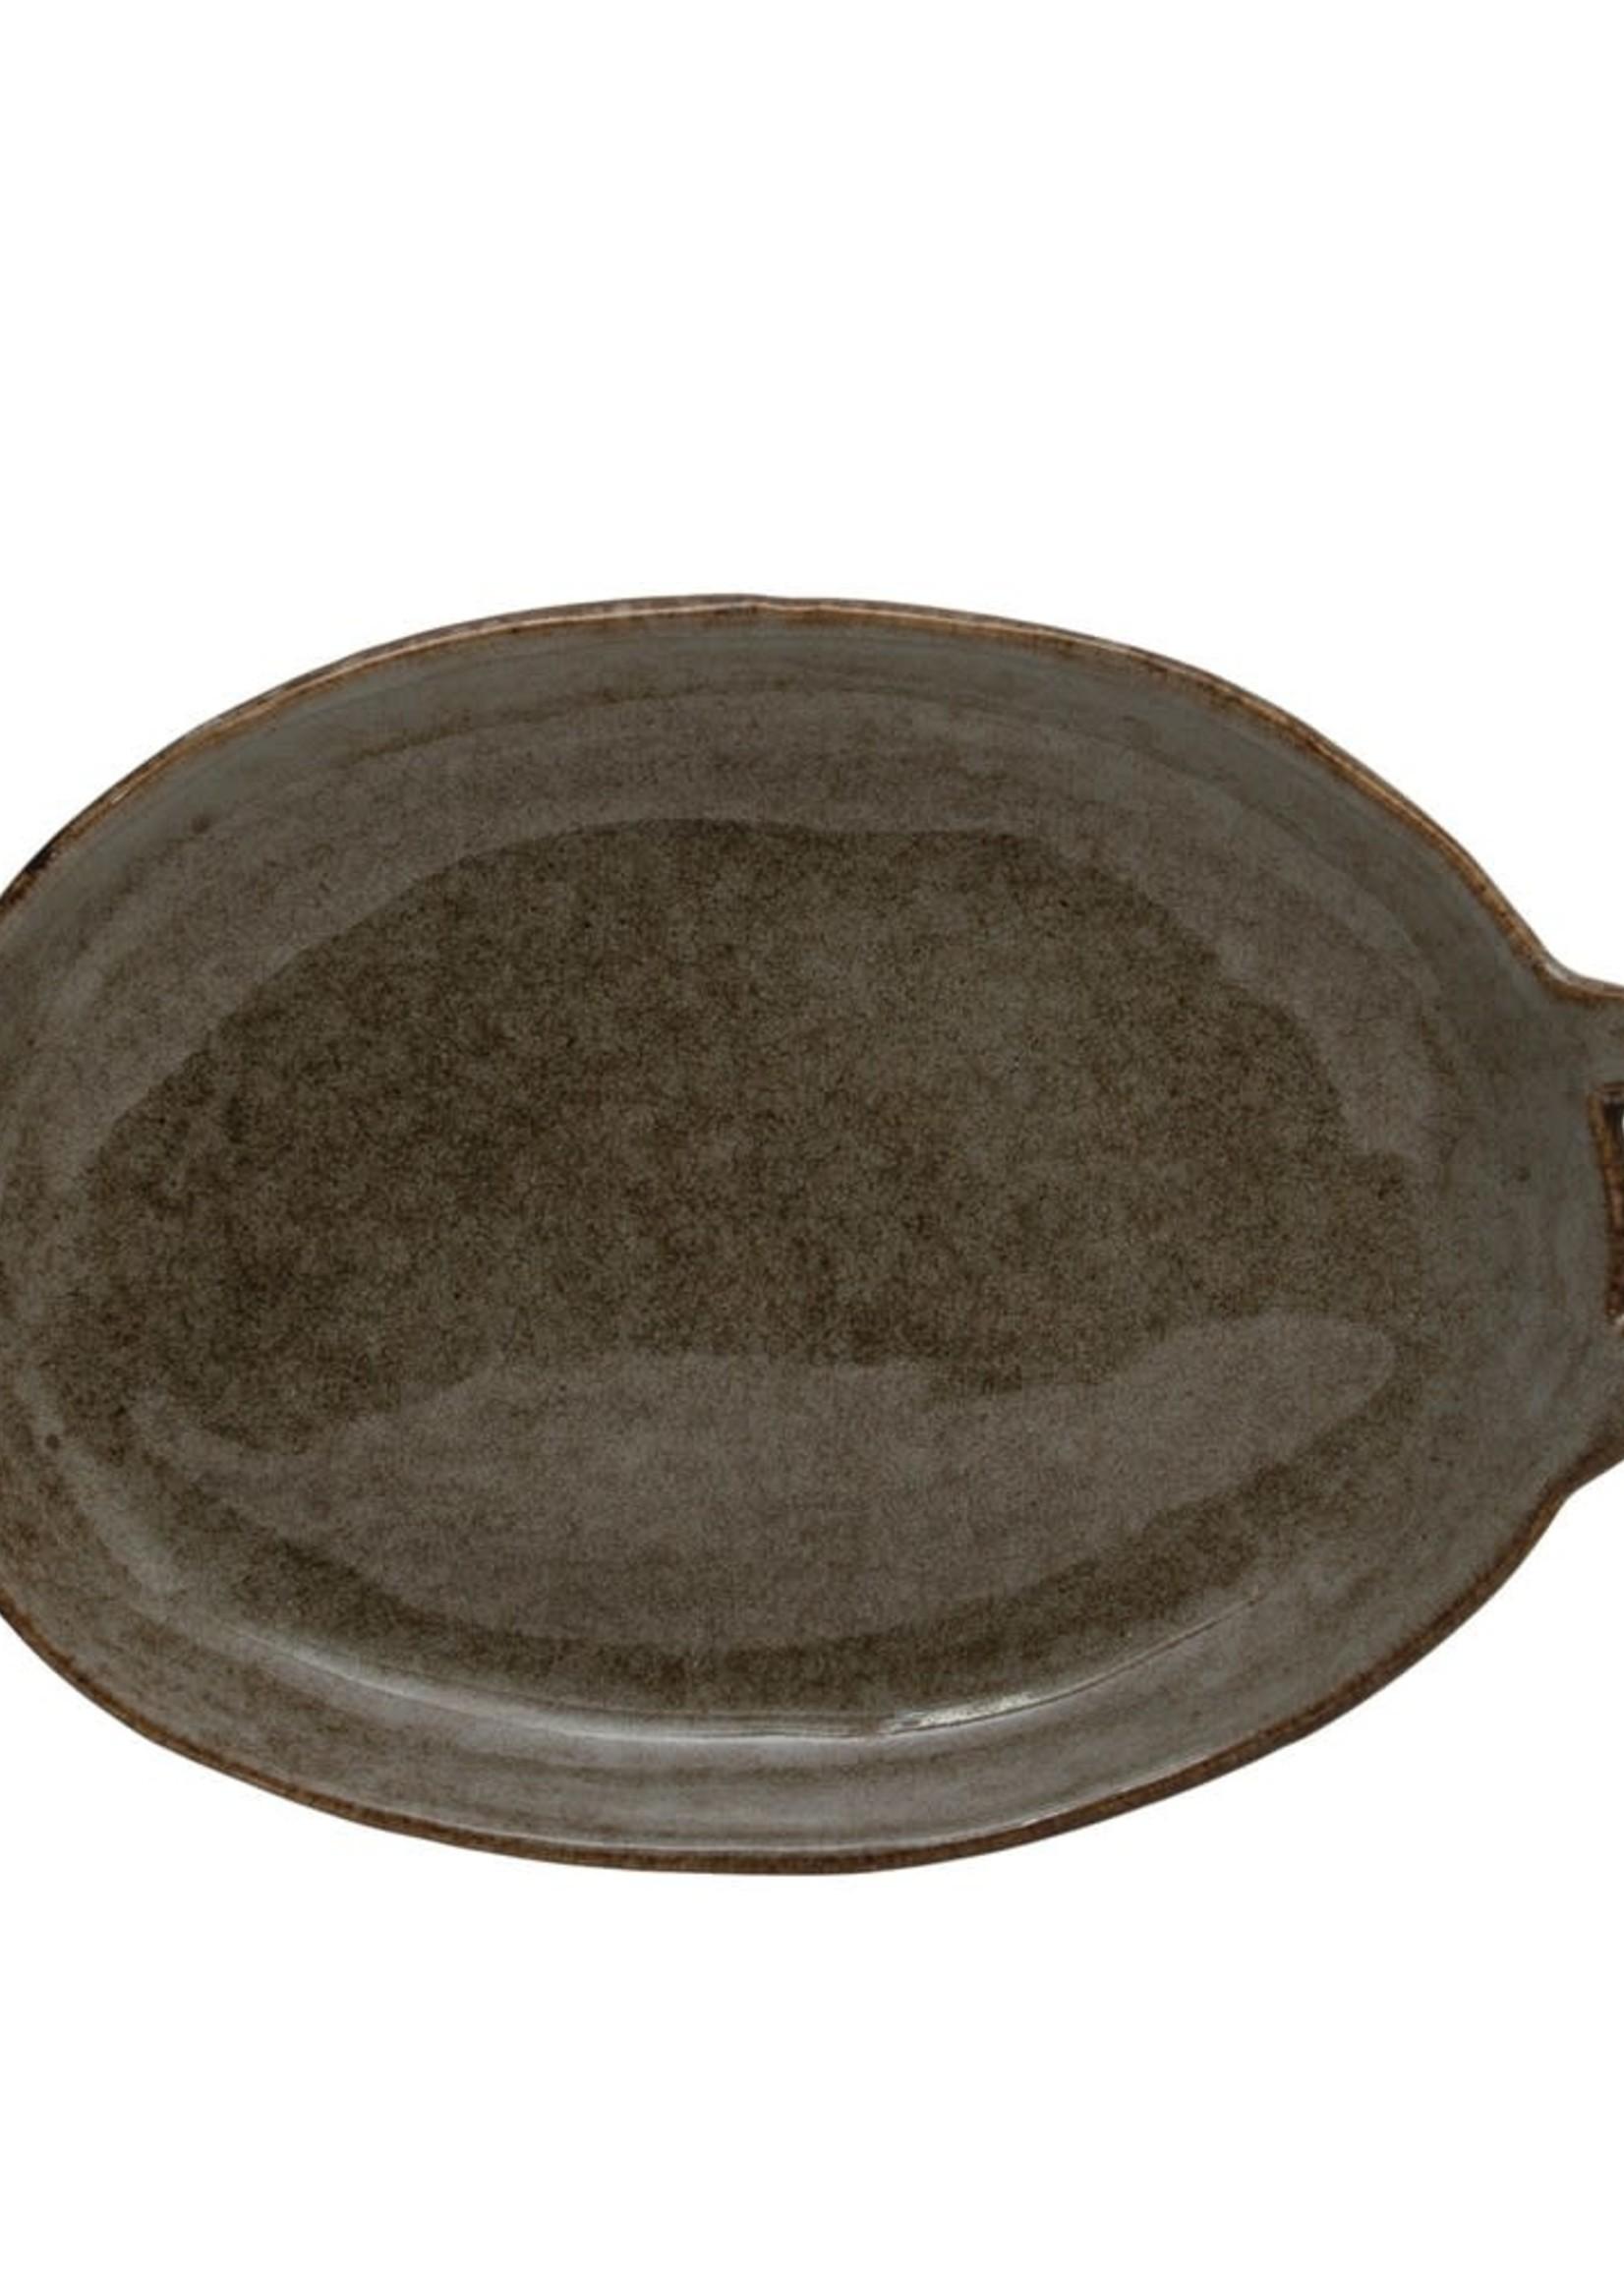 Stoneware Plate with Handle, Reactive Glaze, Grey